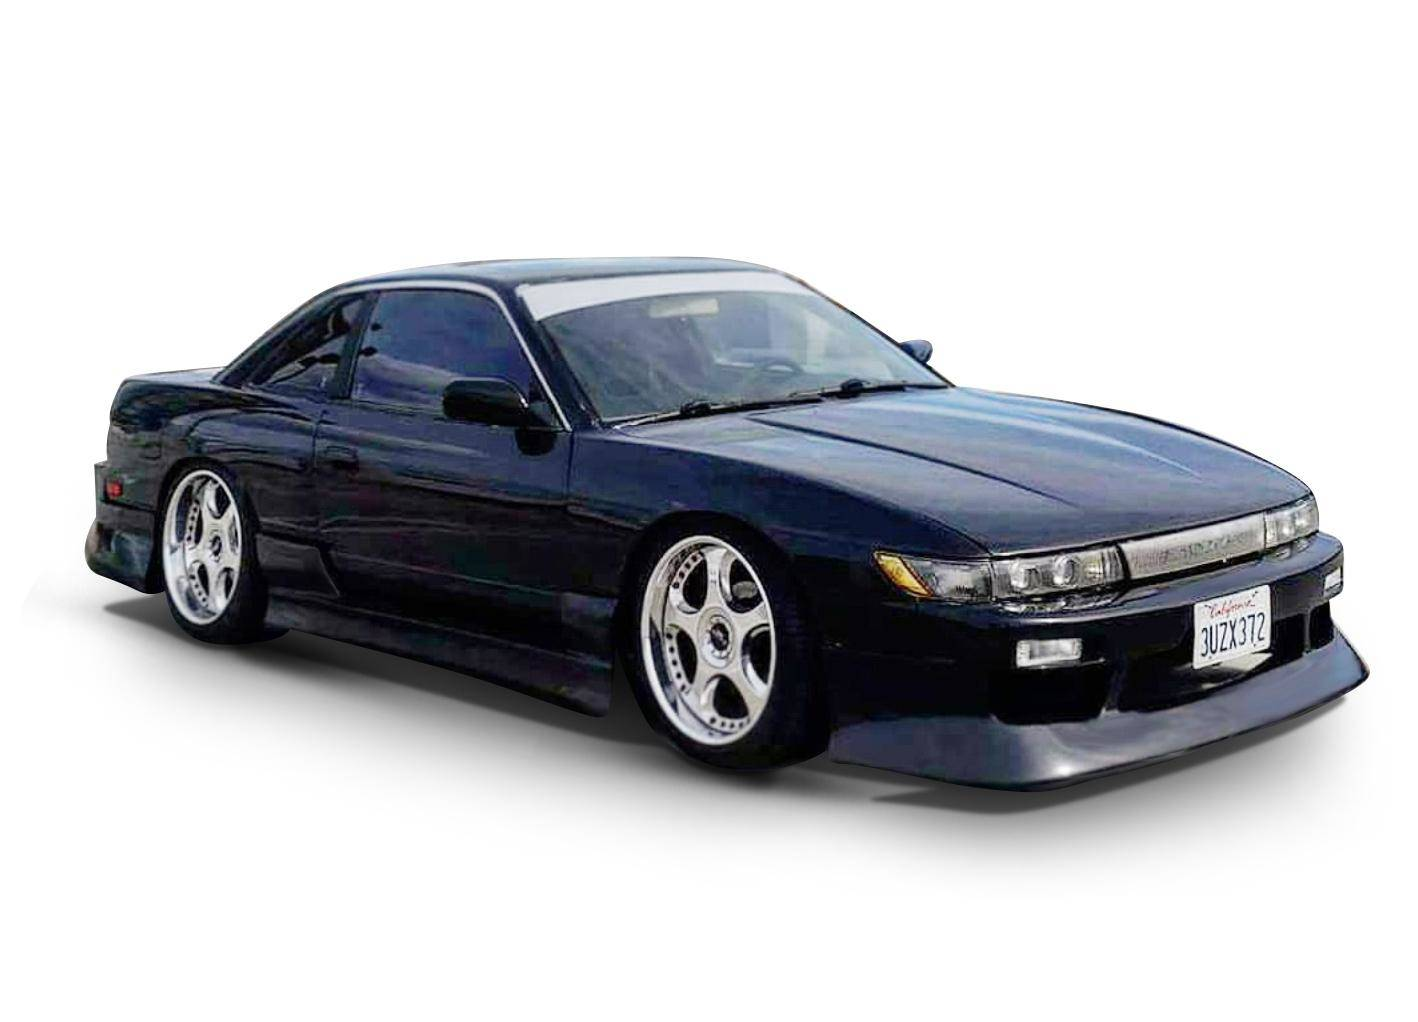 Nissan 240sx S13 Silvia 1989 1994 Bsport Style 1 Piece Polyurethane Front Bumper